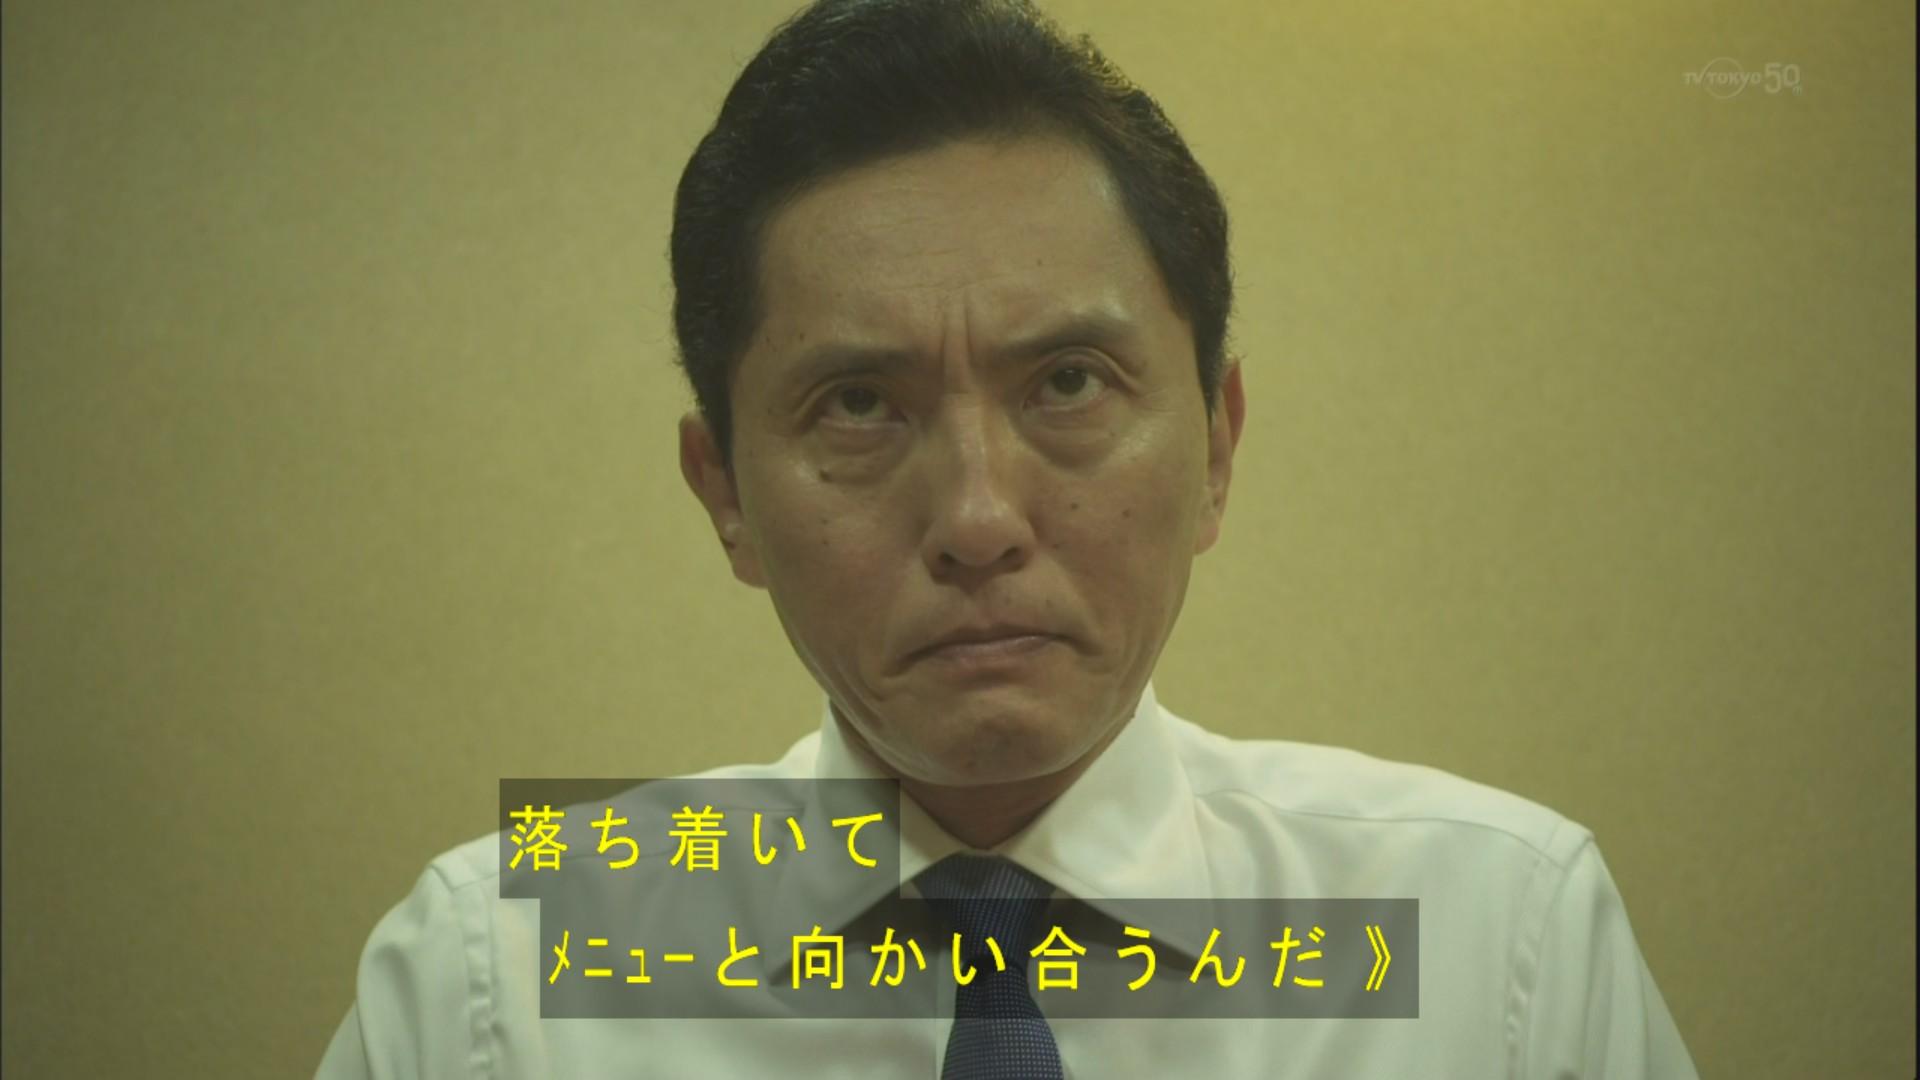 kodokunogurume03-011